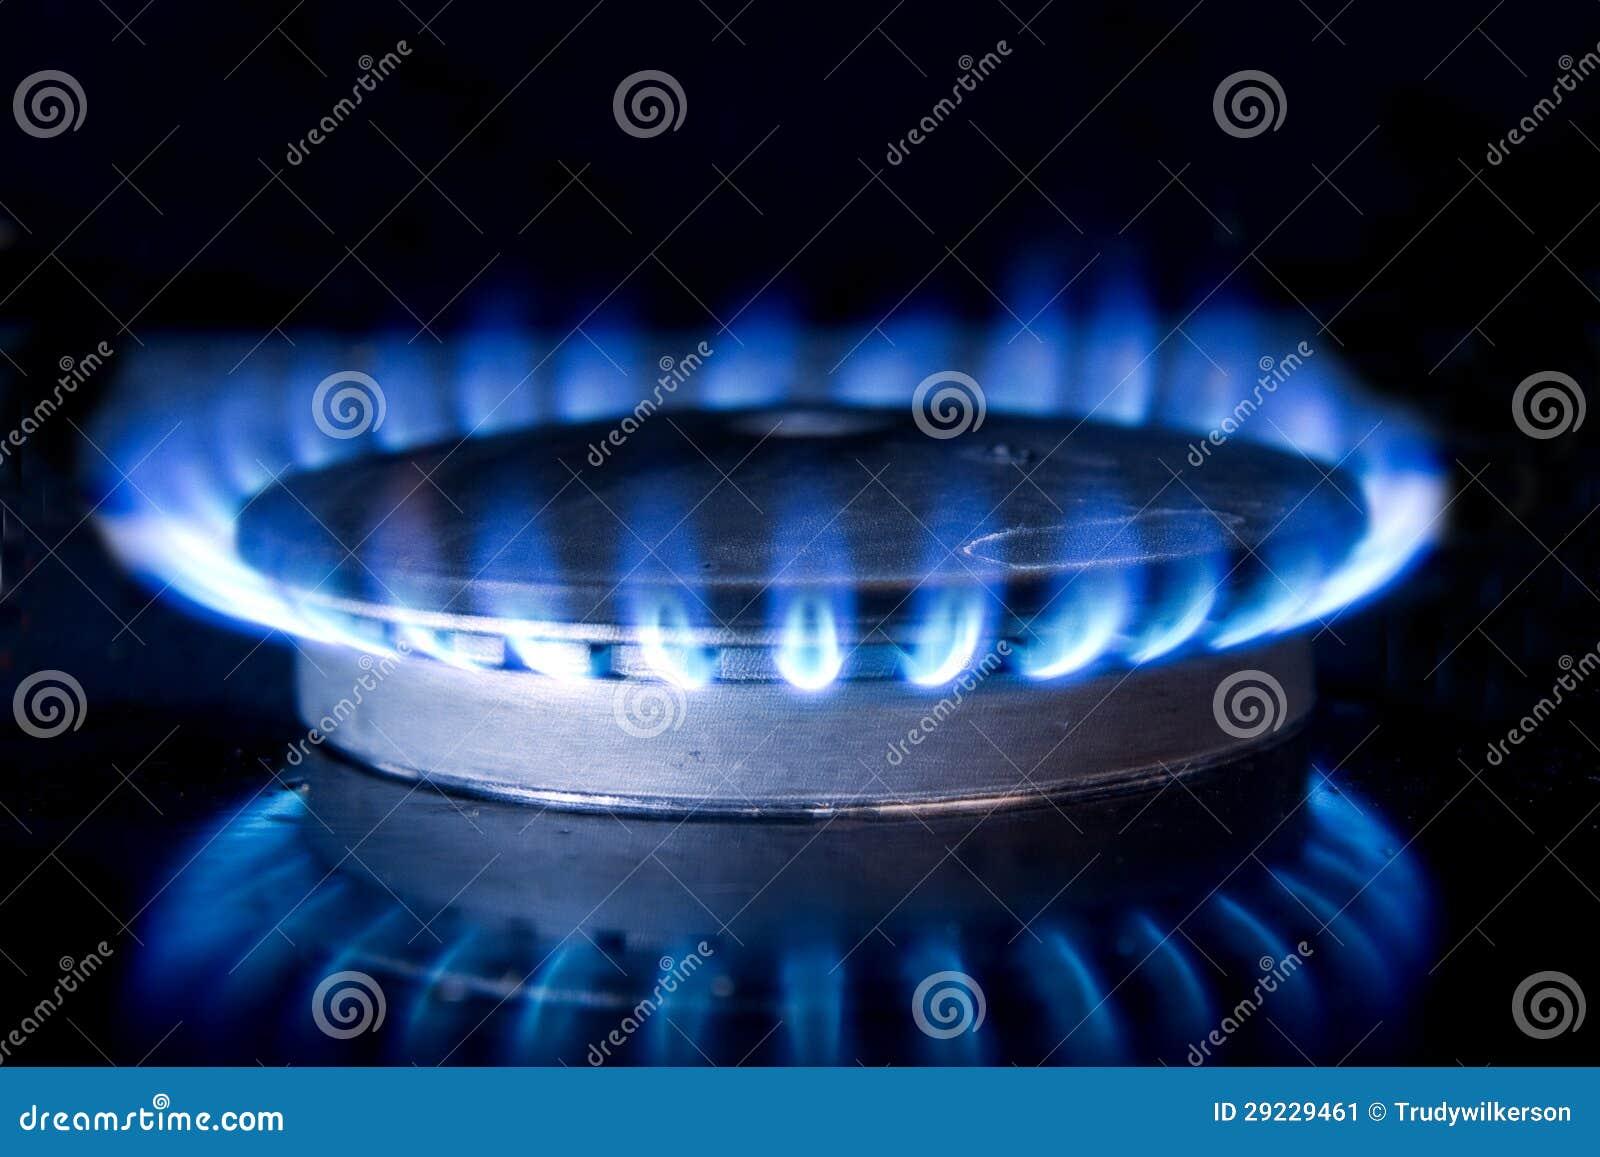 kitchen stove top flame stock image image of heating 29229461. Black Bedroom Furniture Sets. Home Design Ideas